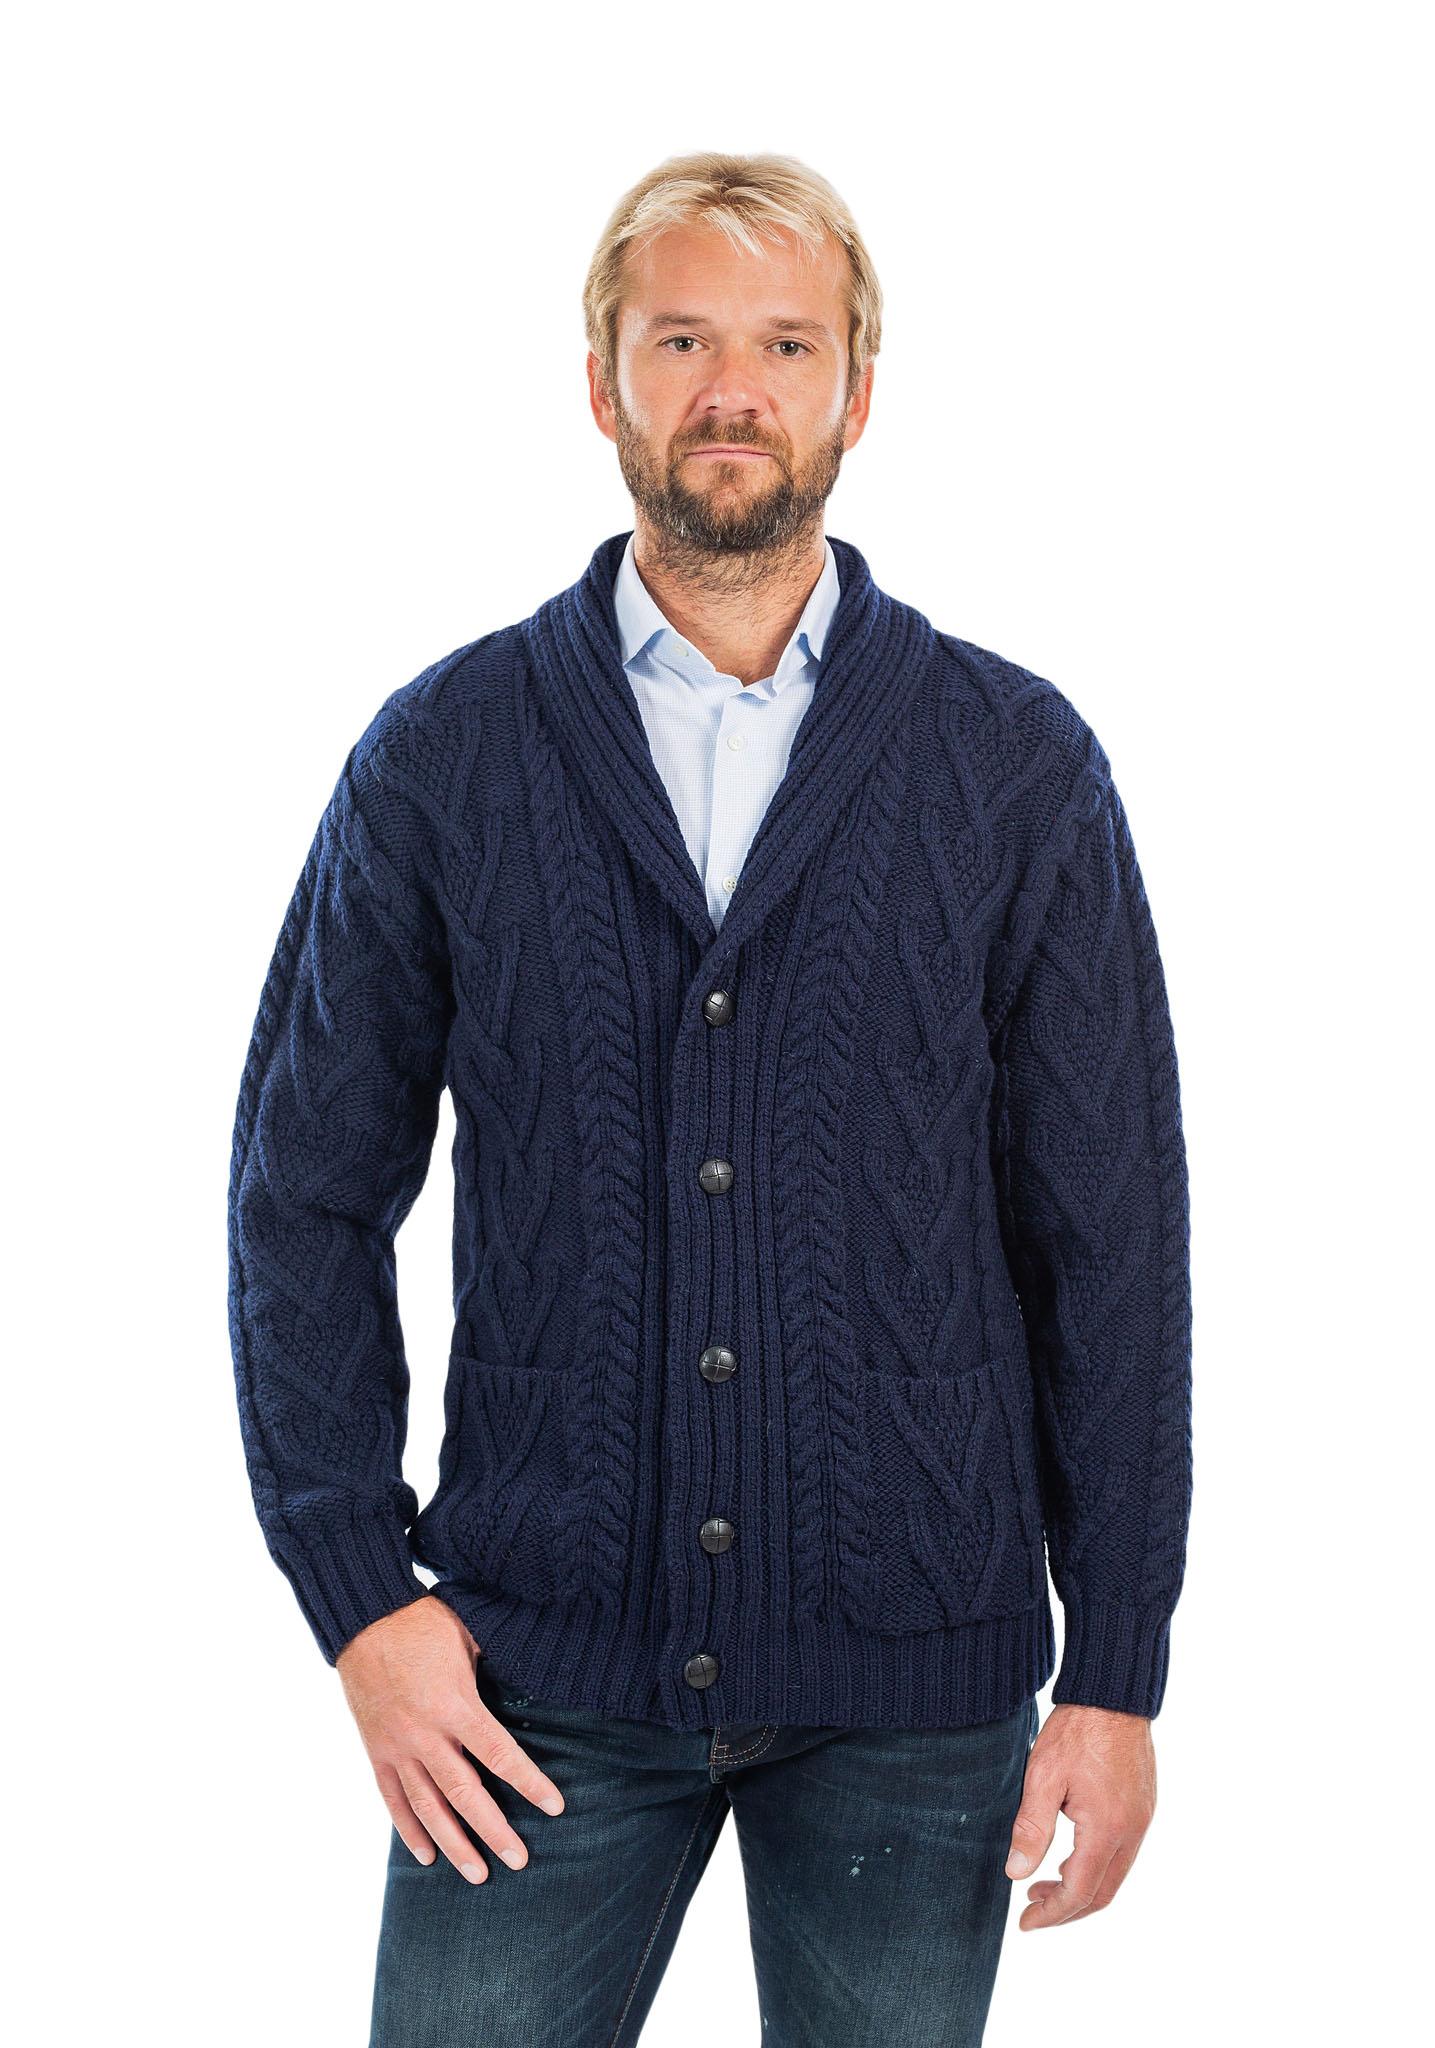 SAOL-Mens-Irish-Merino-Wool-Cardigan-Shawl-Collar-Front-Pockets-Aran-Cable-Knit thumbnail 18